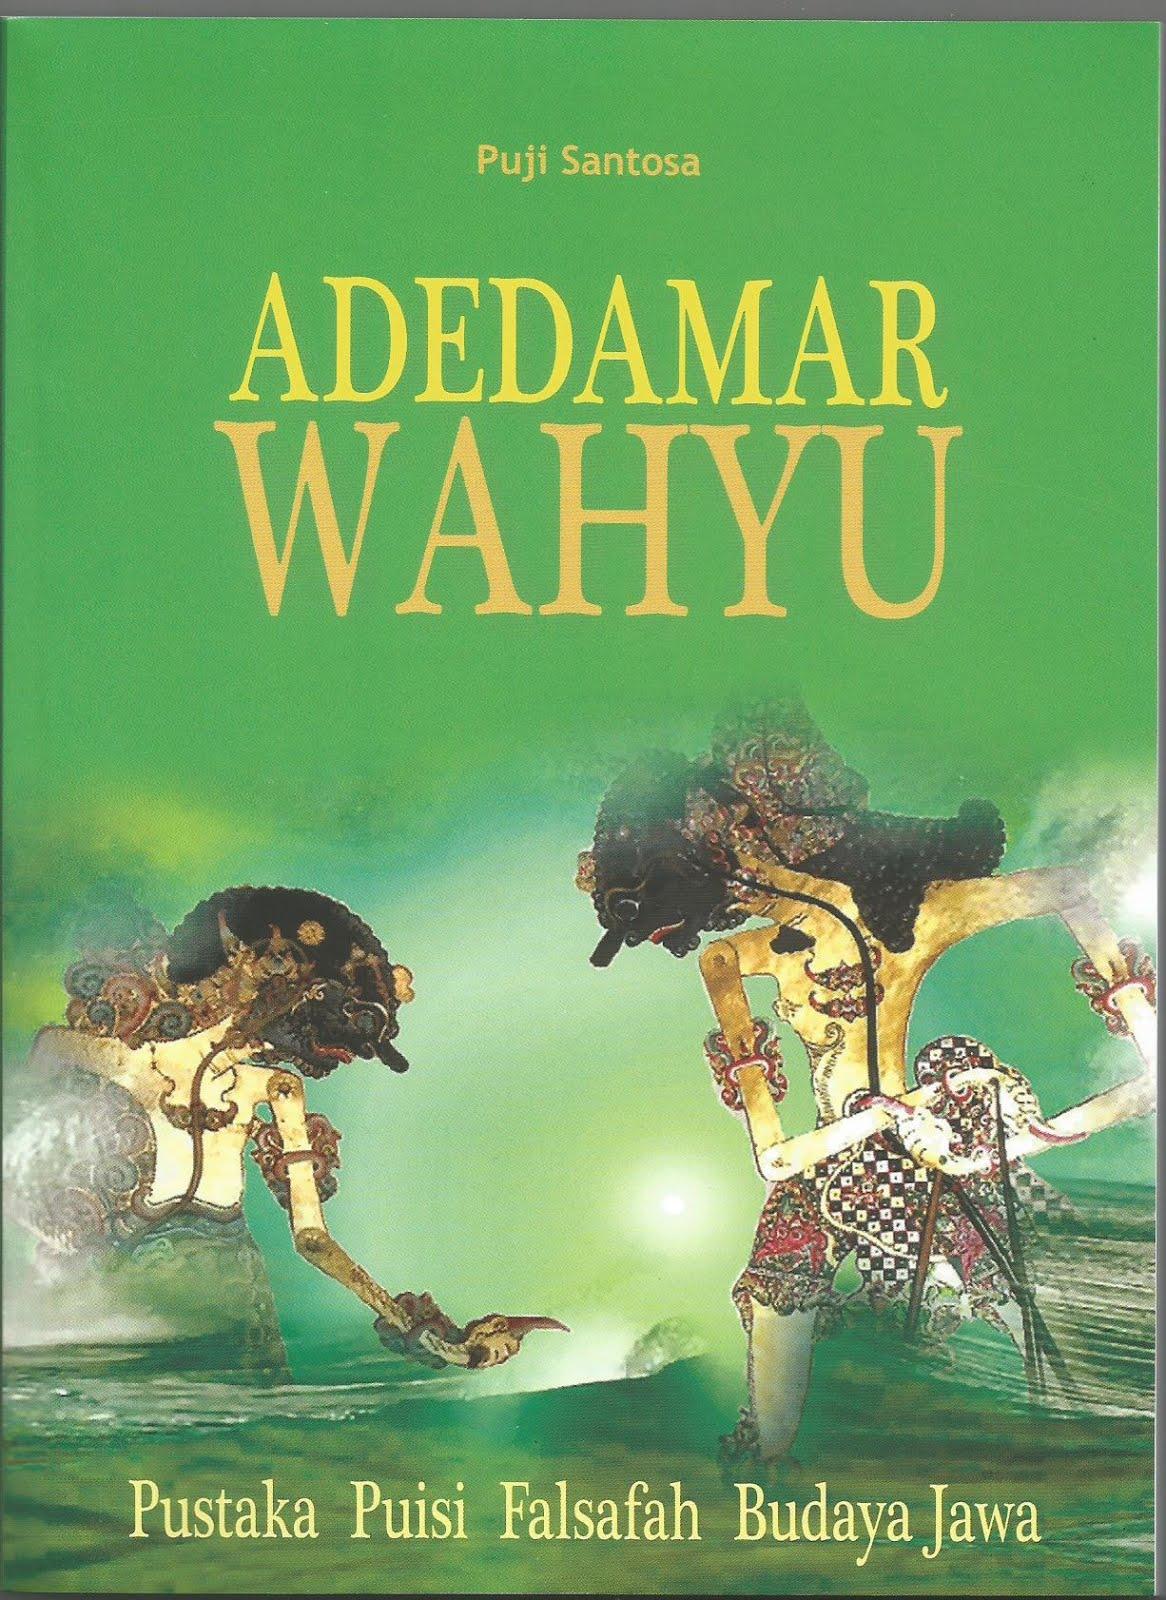 ADEDAMAR WAHYU: Pustaka Puisi Falsafah Budaya Jawa